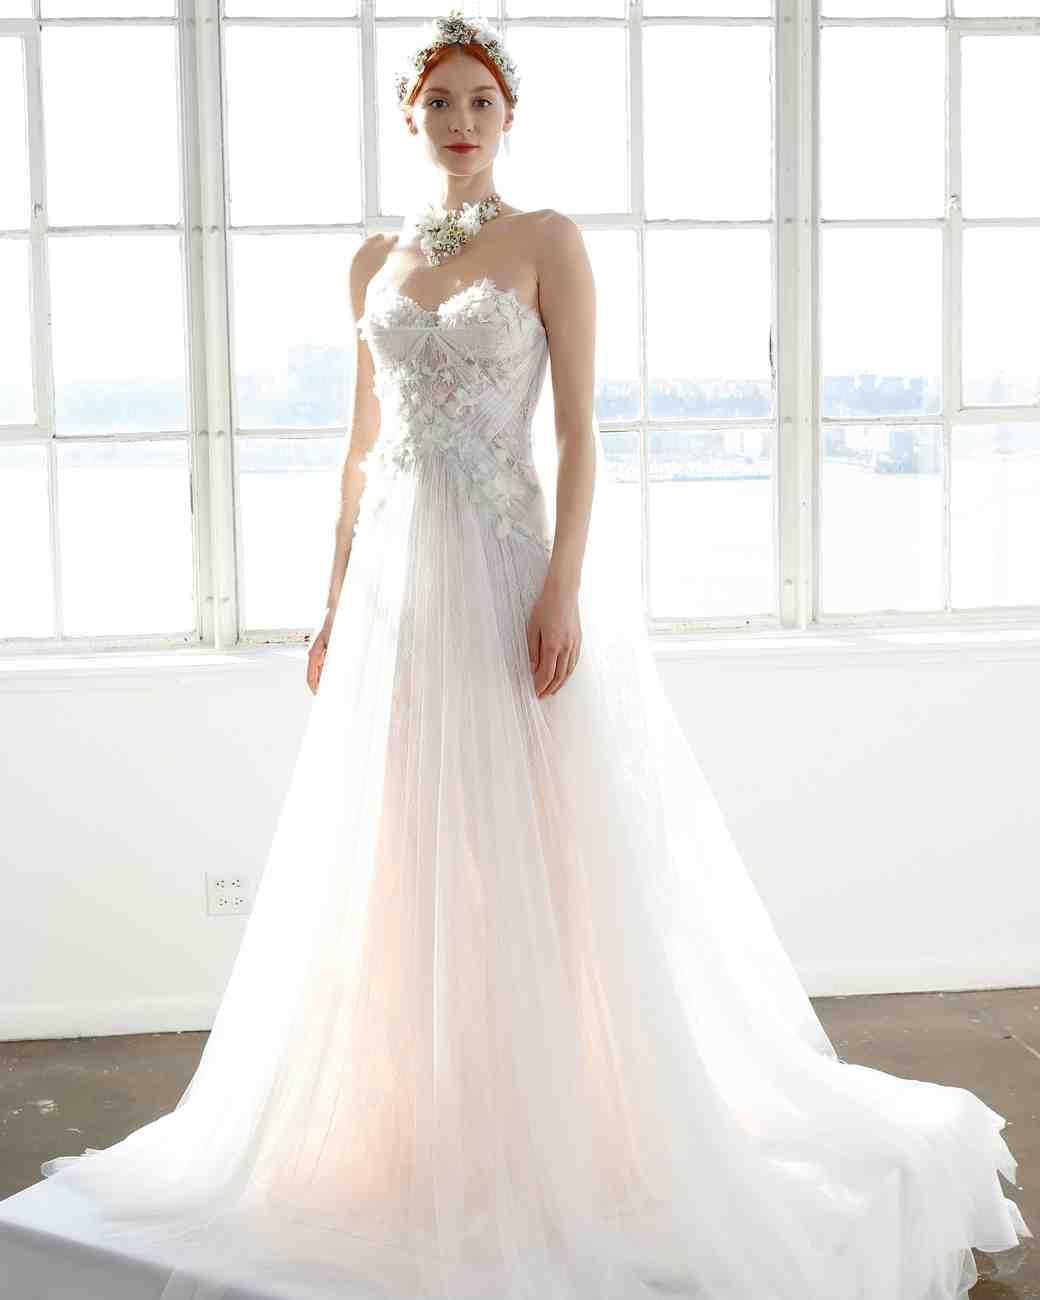 Marchesa wedding dresses images